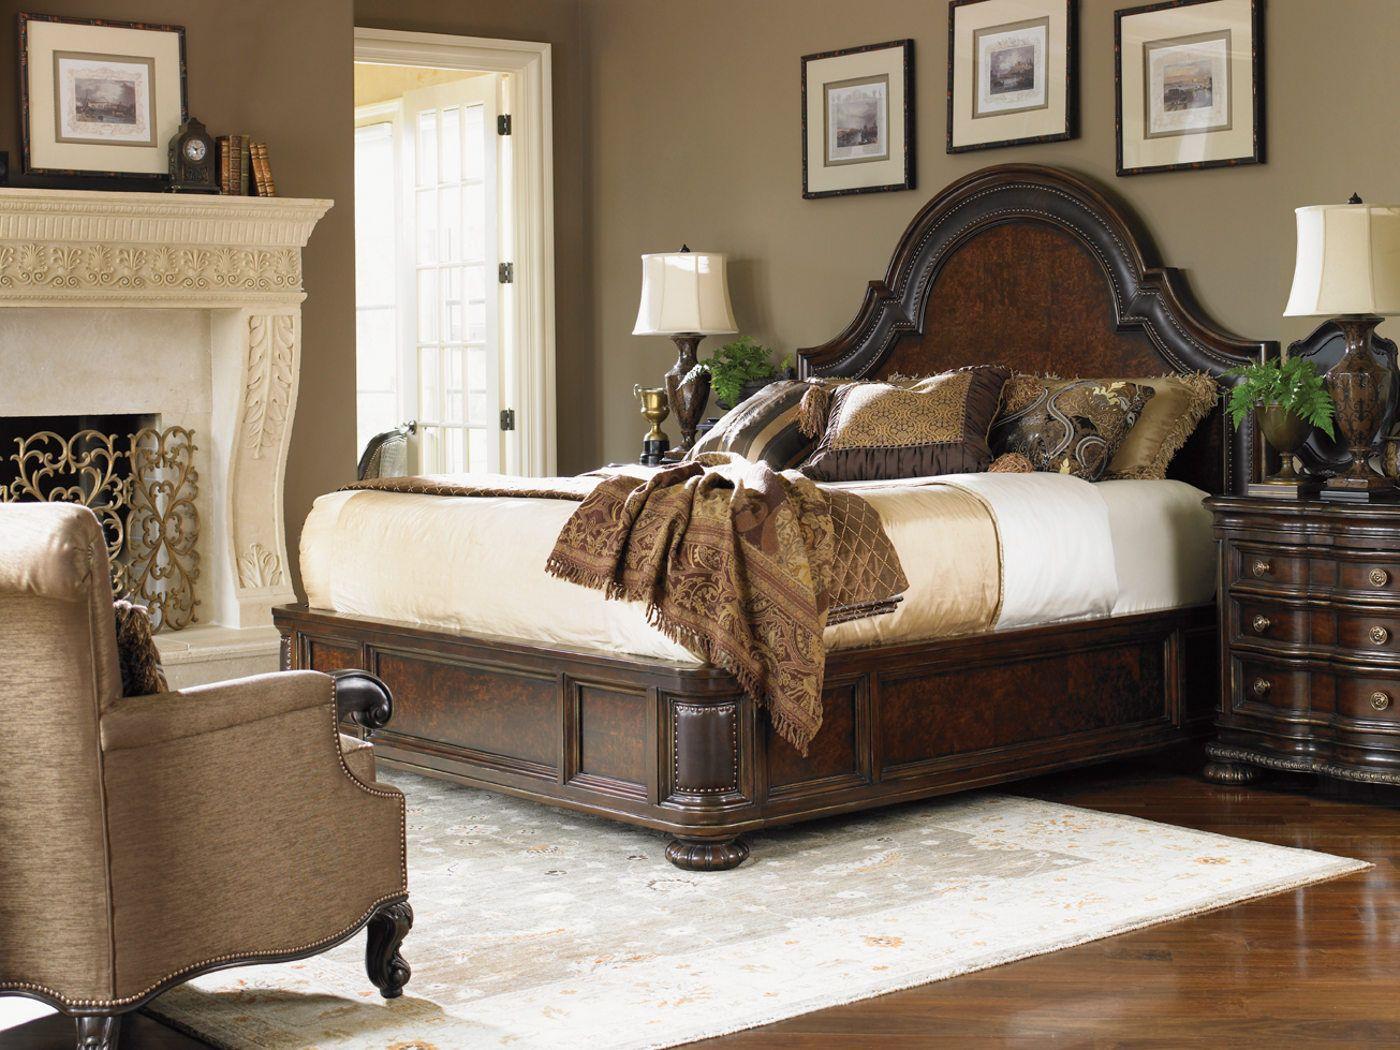 Cavallino Bedroom Set Part - 37: Fairmont Designs Florentino Cavallino Platform Bedroom Set